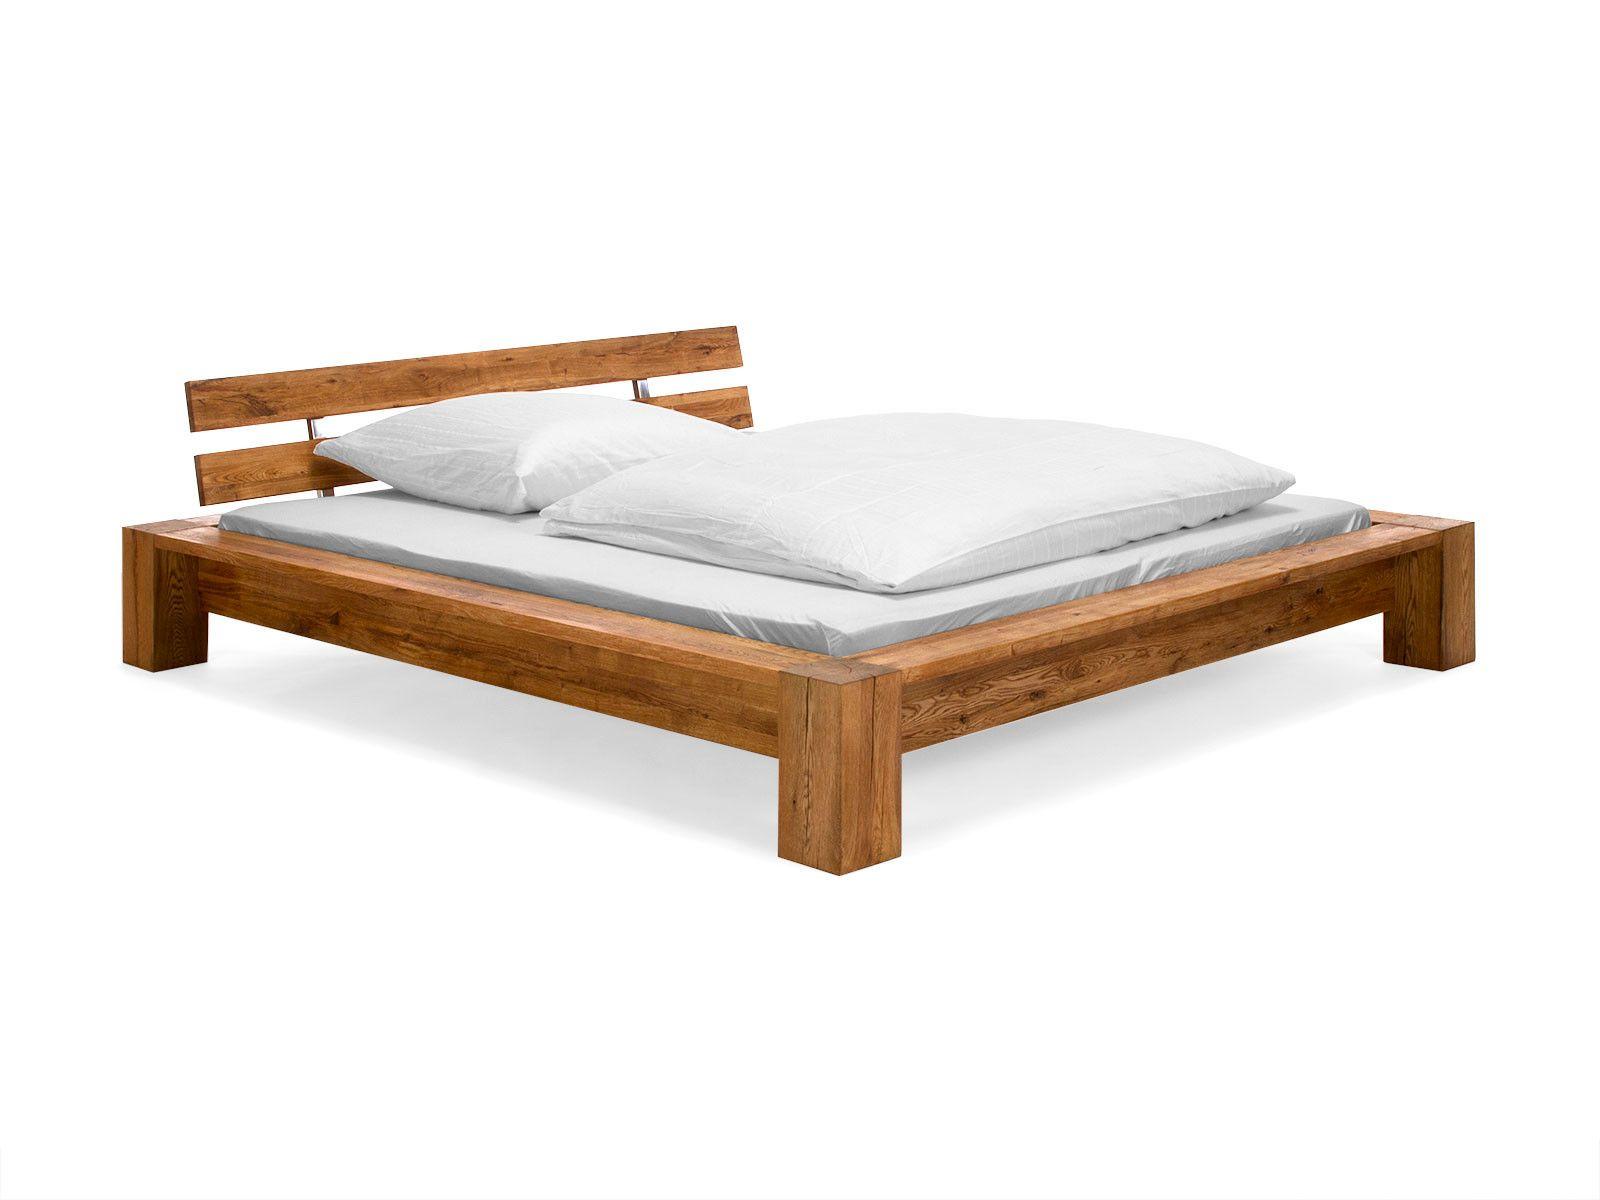 Superb Tolles Dekoration Bett Holz 140x200 #12: Tolle Bett Holz 140x200